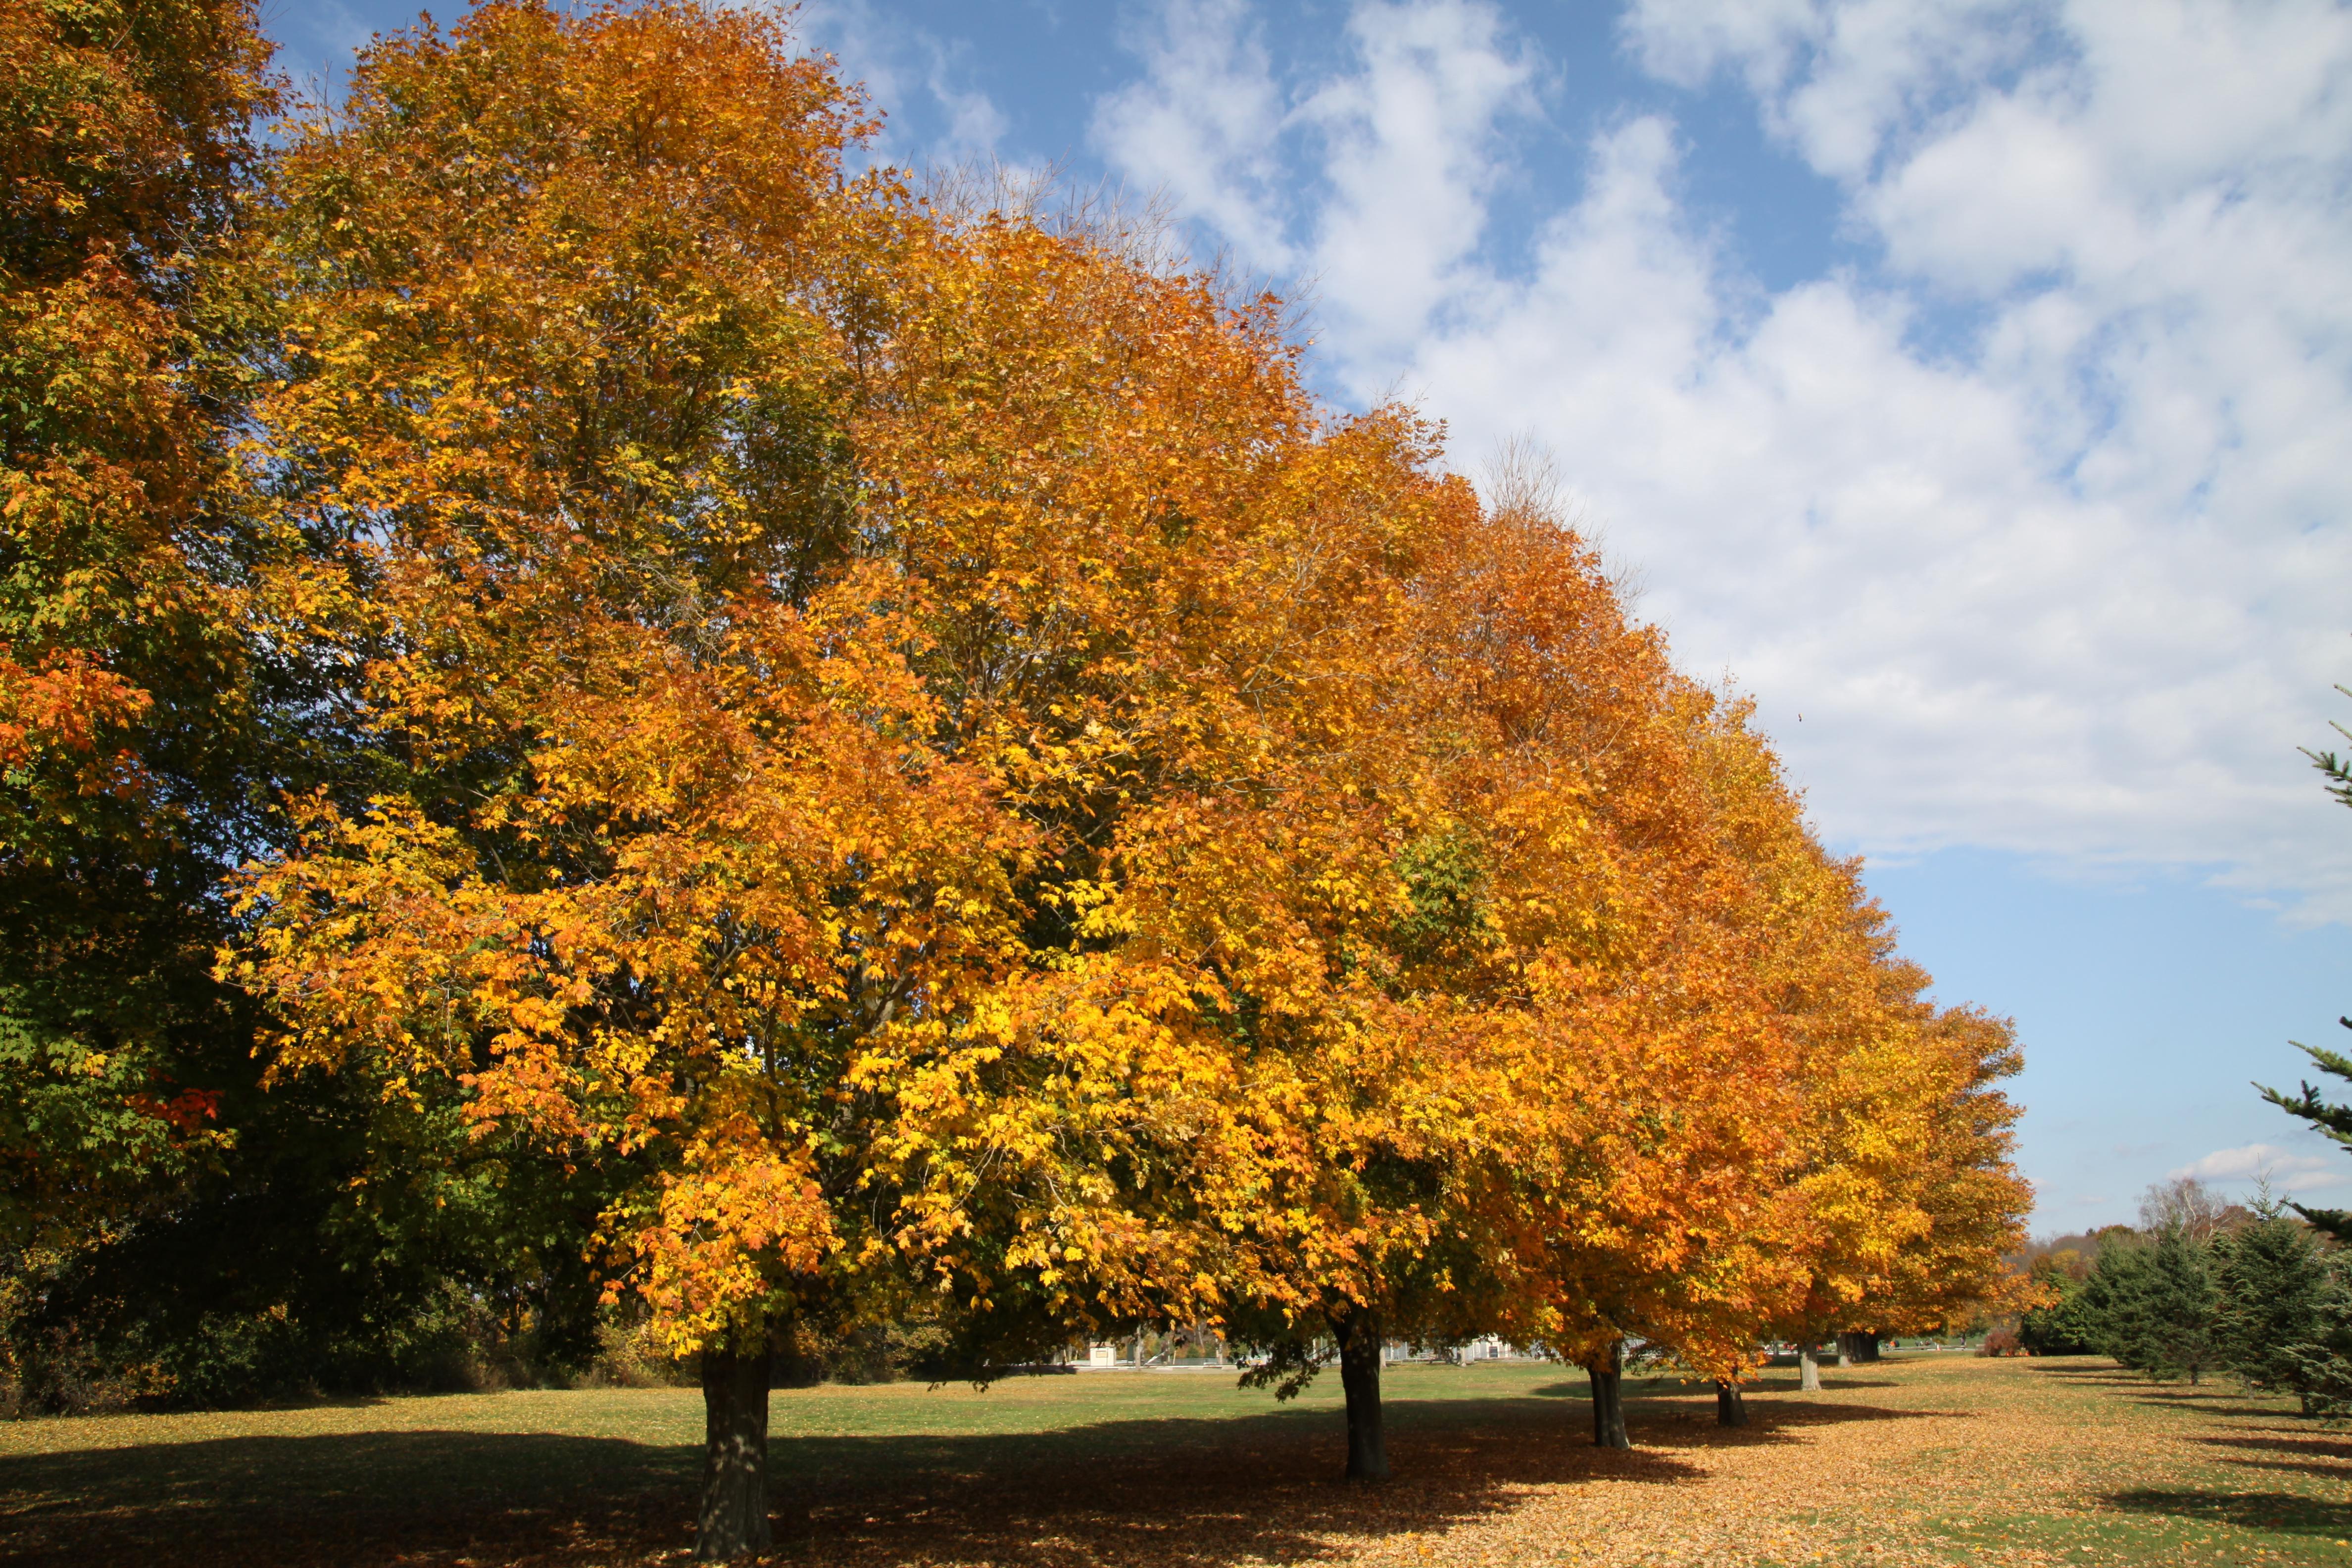 7292 fall foliage colt state park crJenniferBalch